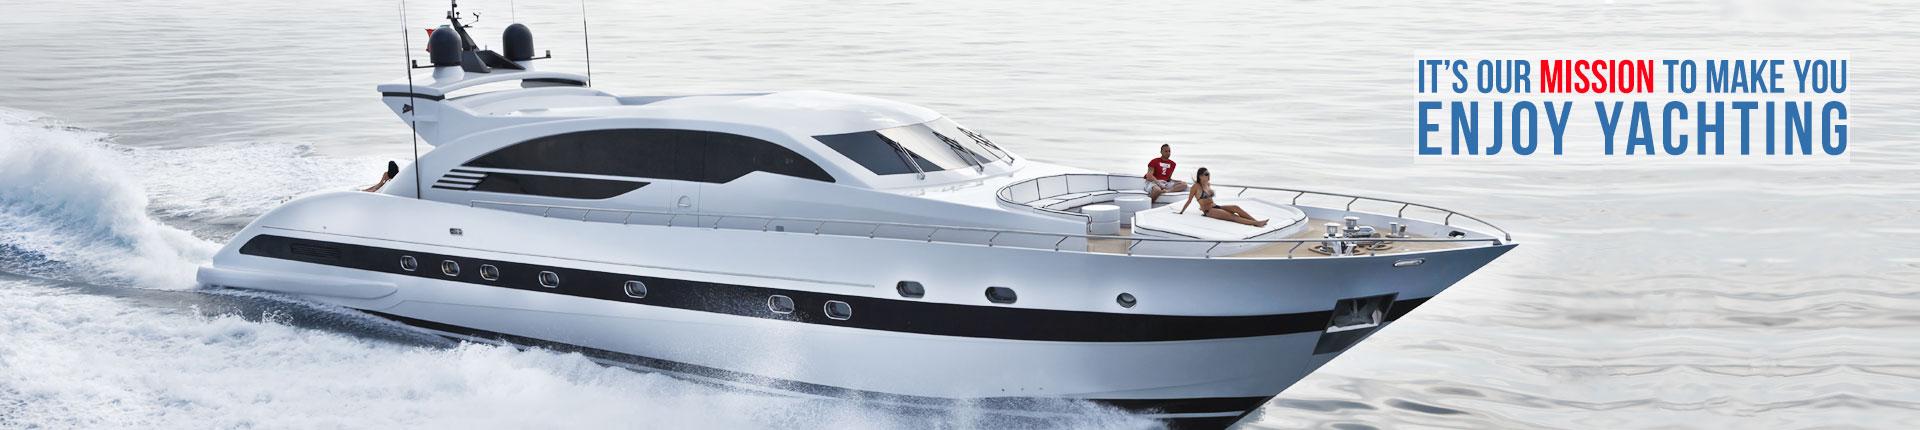 electronaval-yachts-marine-mission